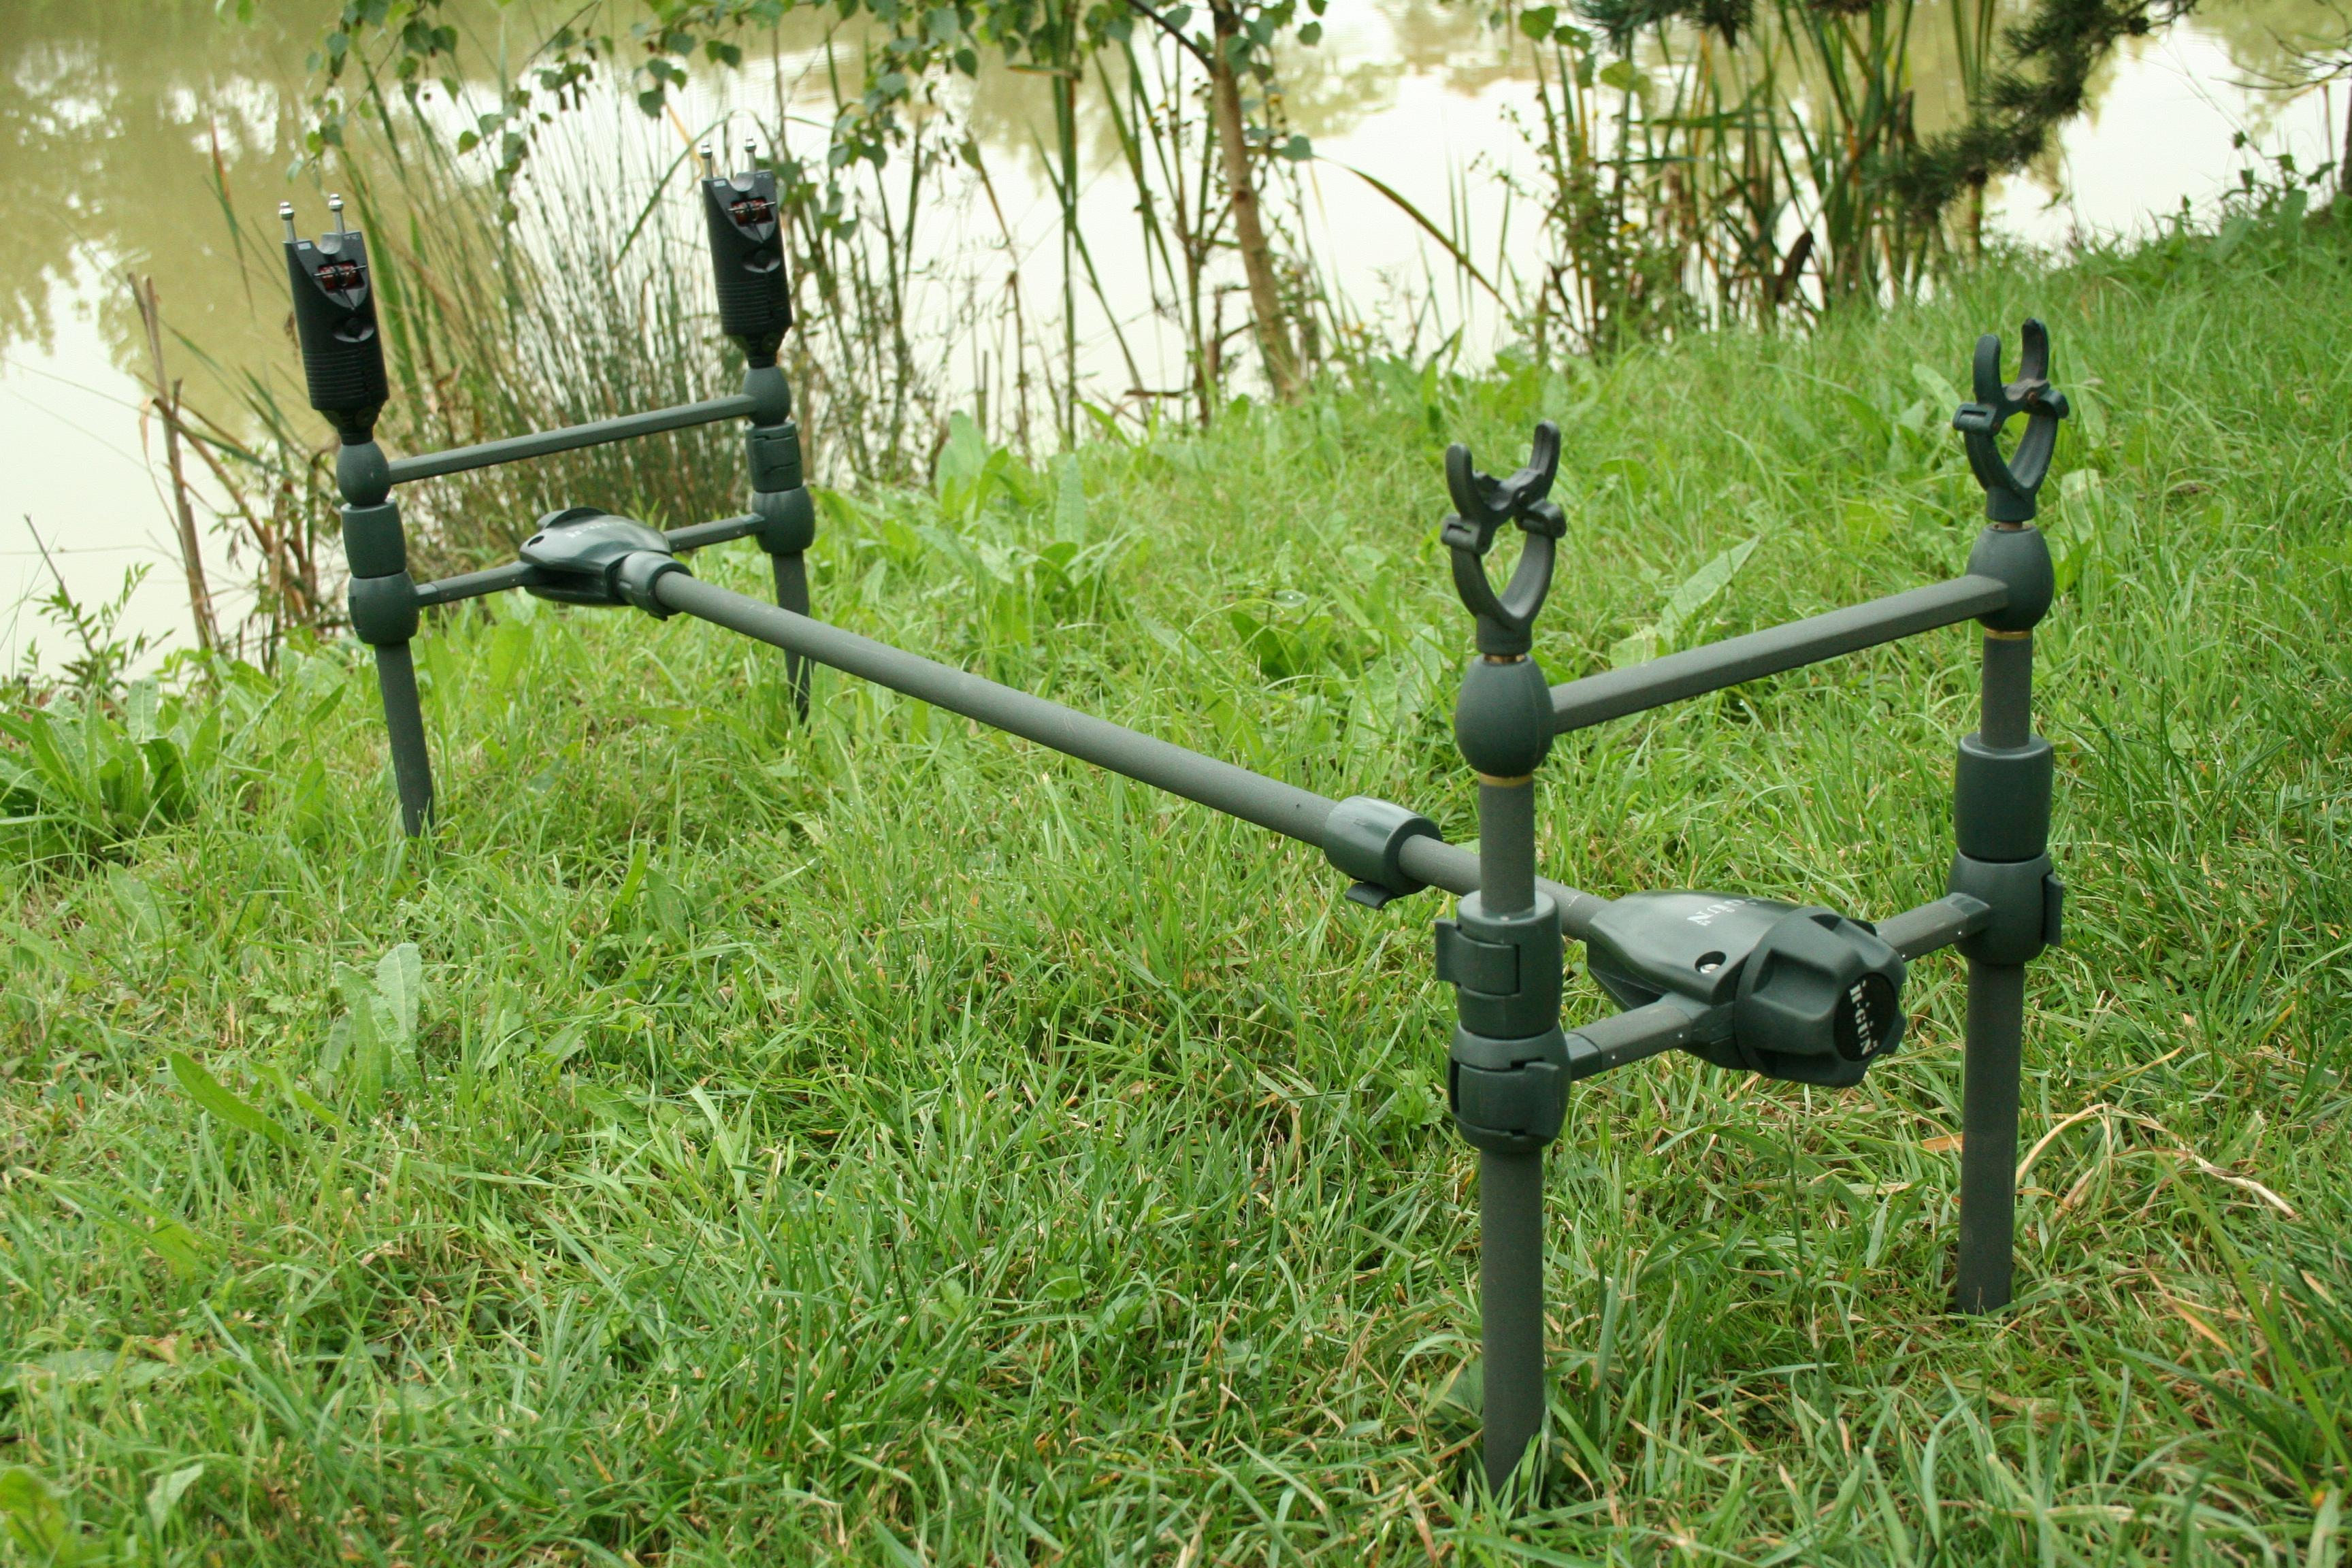 Nash Rod Pod *2 or 3 Rod* NEW Fishing Pods Adjustable Rod Support